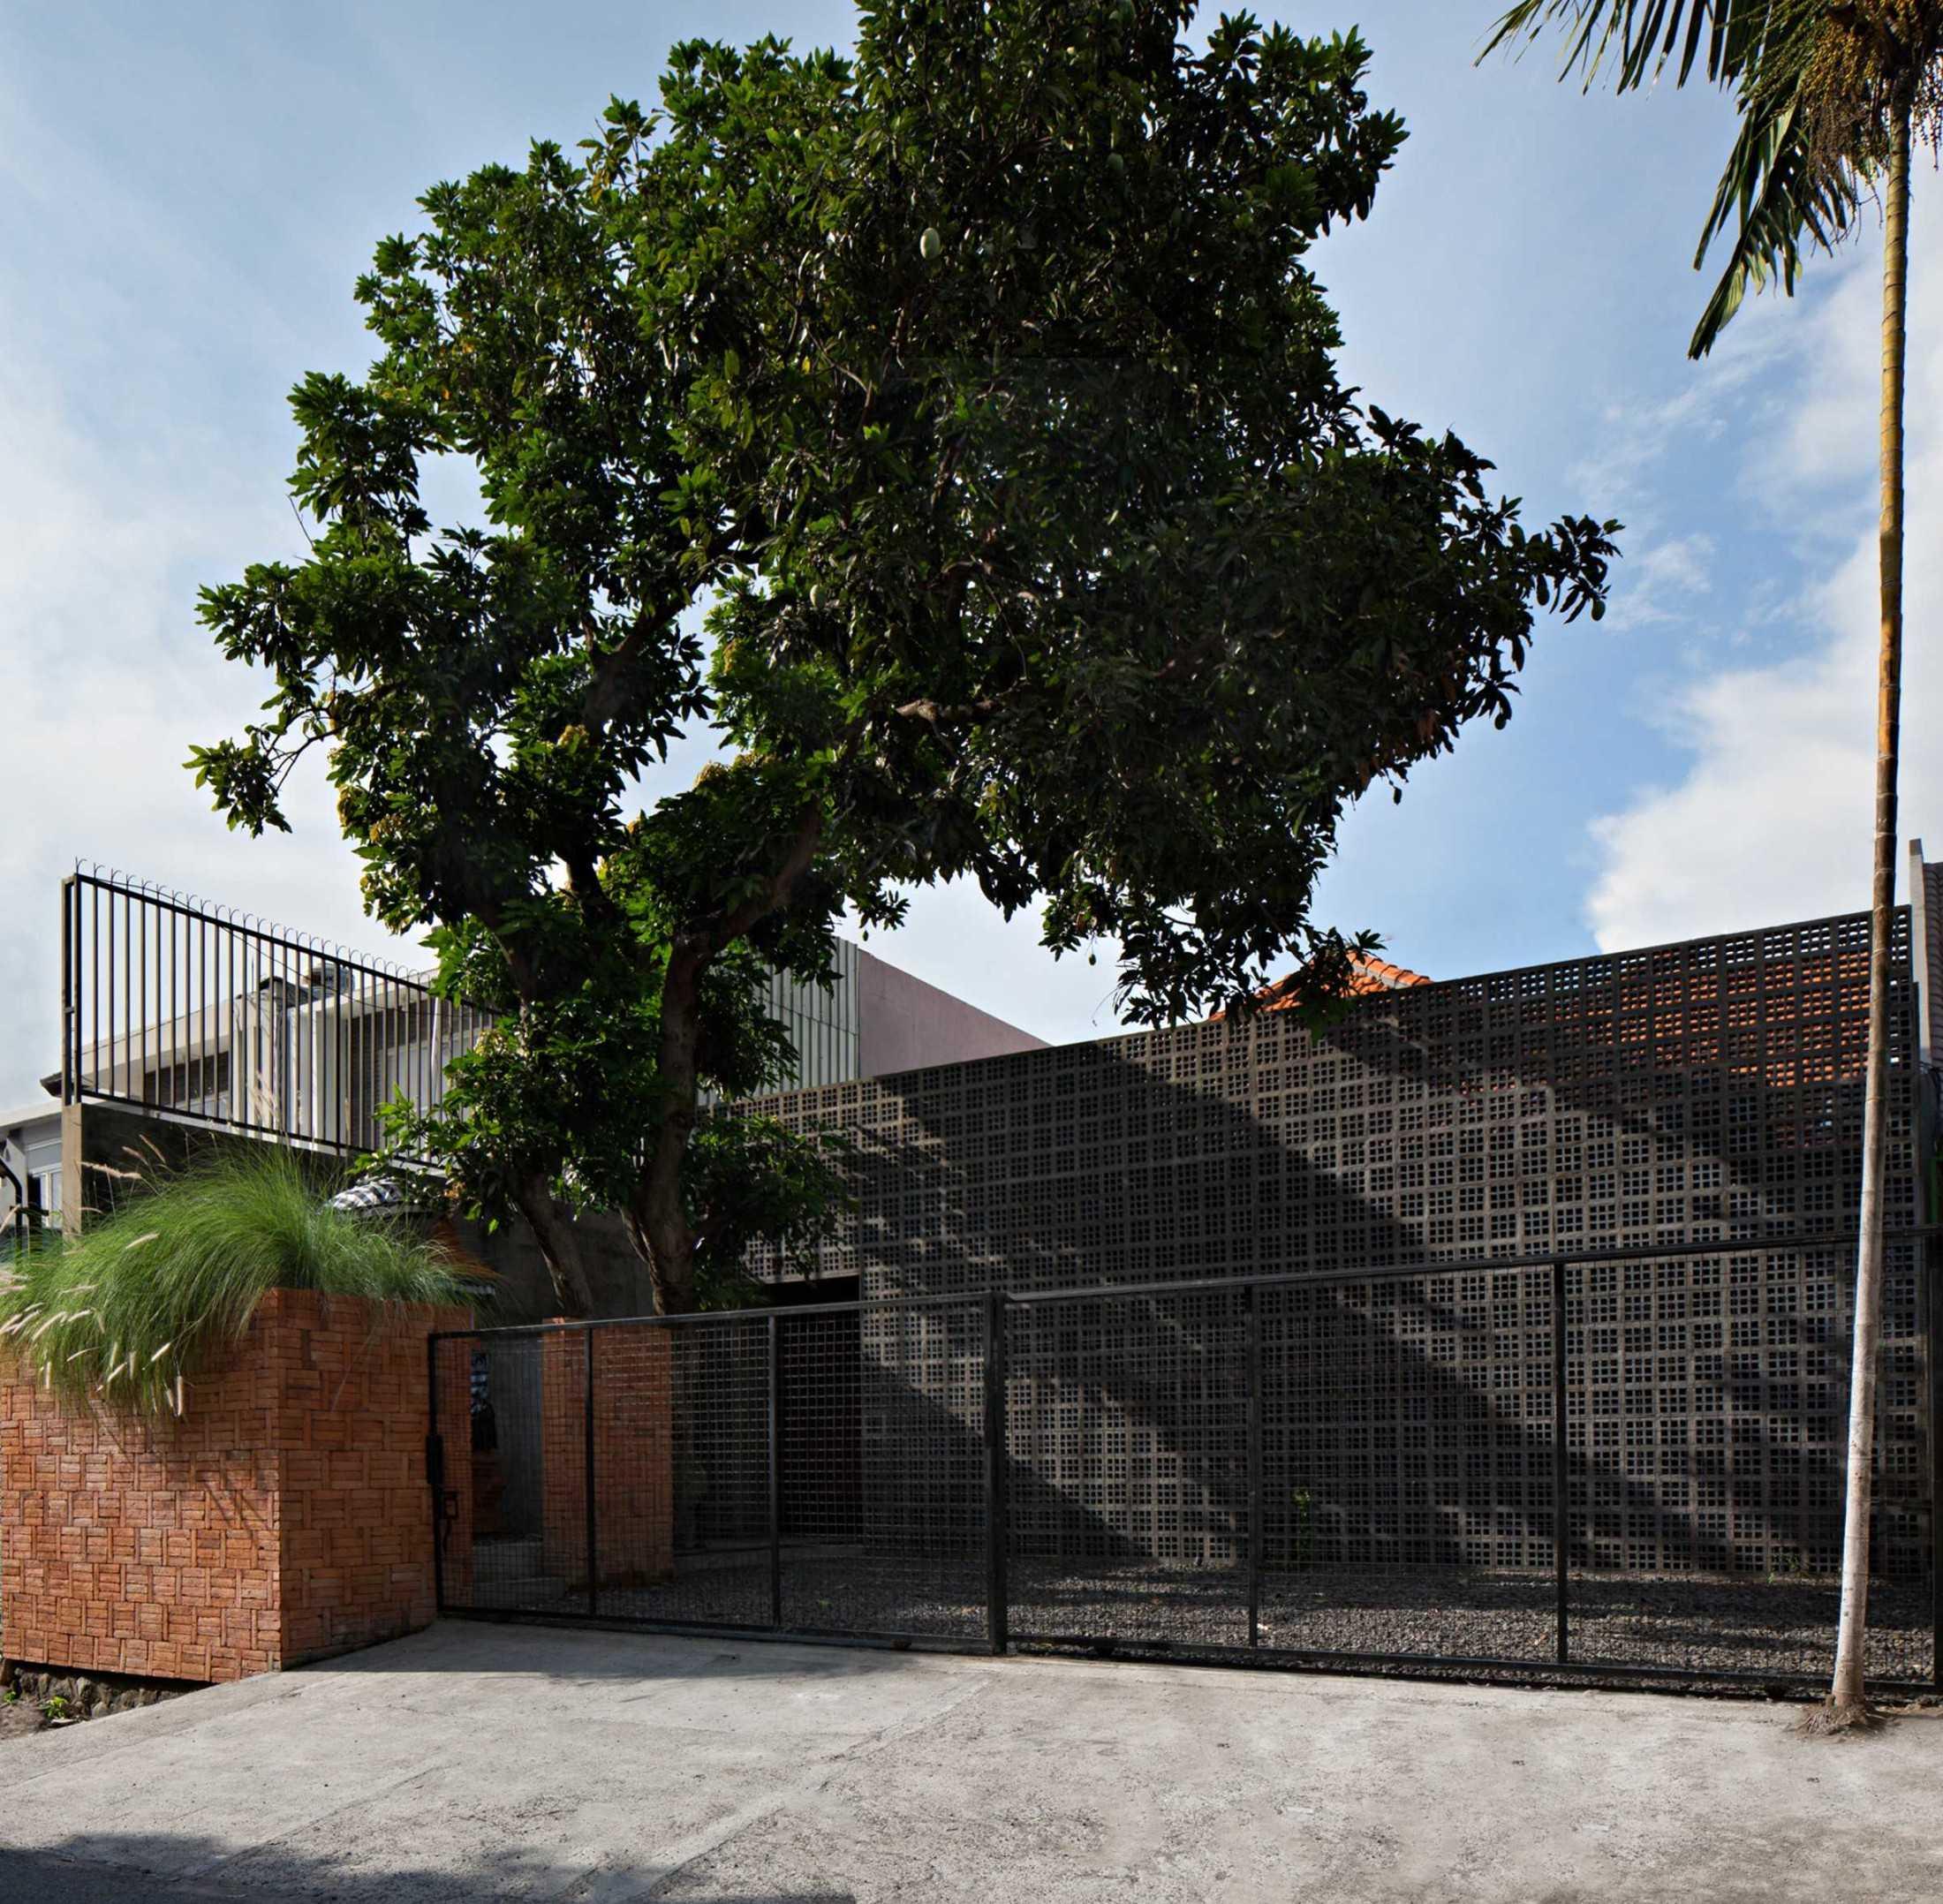 Somia Design Mandanila House Jl. Ciungwanara Ii, Renon, Denpasar Sel., Kota Denpasar, Bali, Indonesia Jl. Ciungwanara Ii, Renon, Denpasar Sel., Kota Denpasar, Bali, Indonesia Somia-Design-Mandanila-House  60209